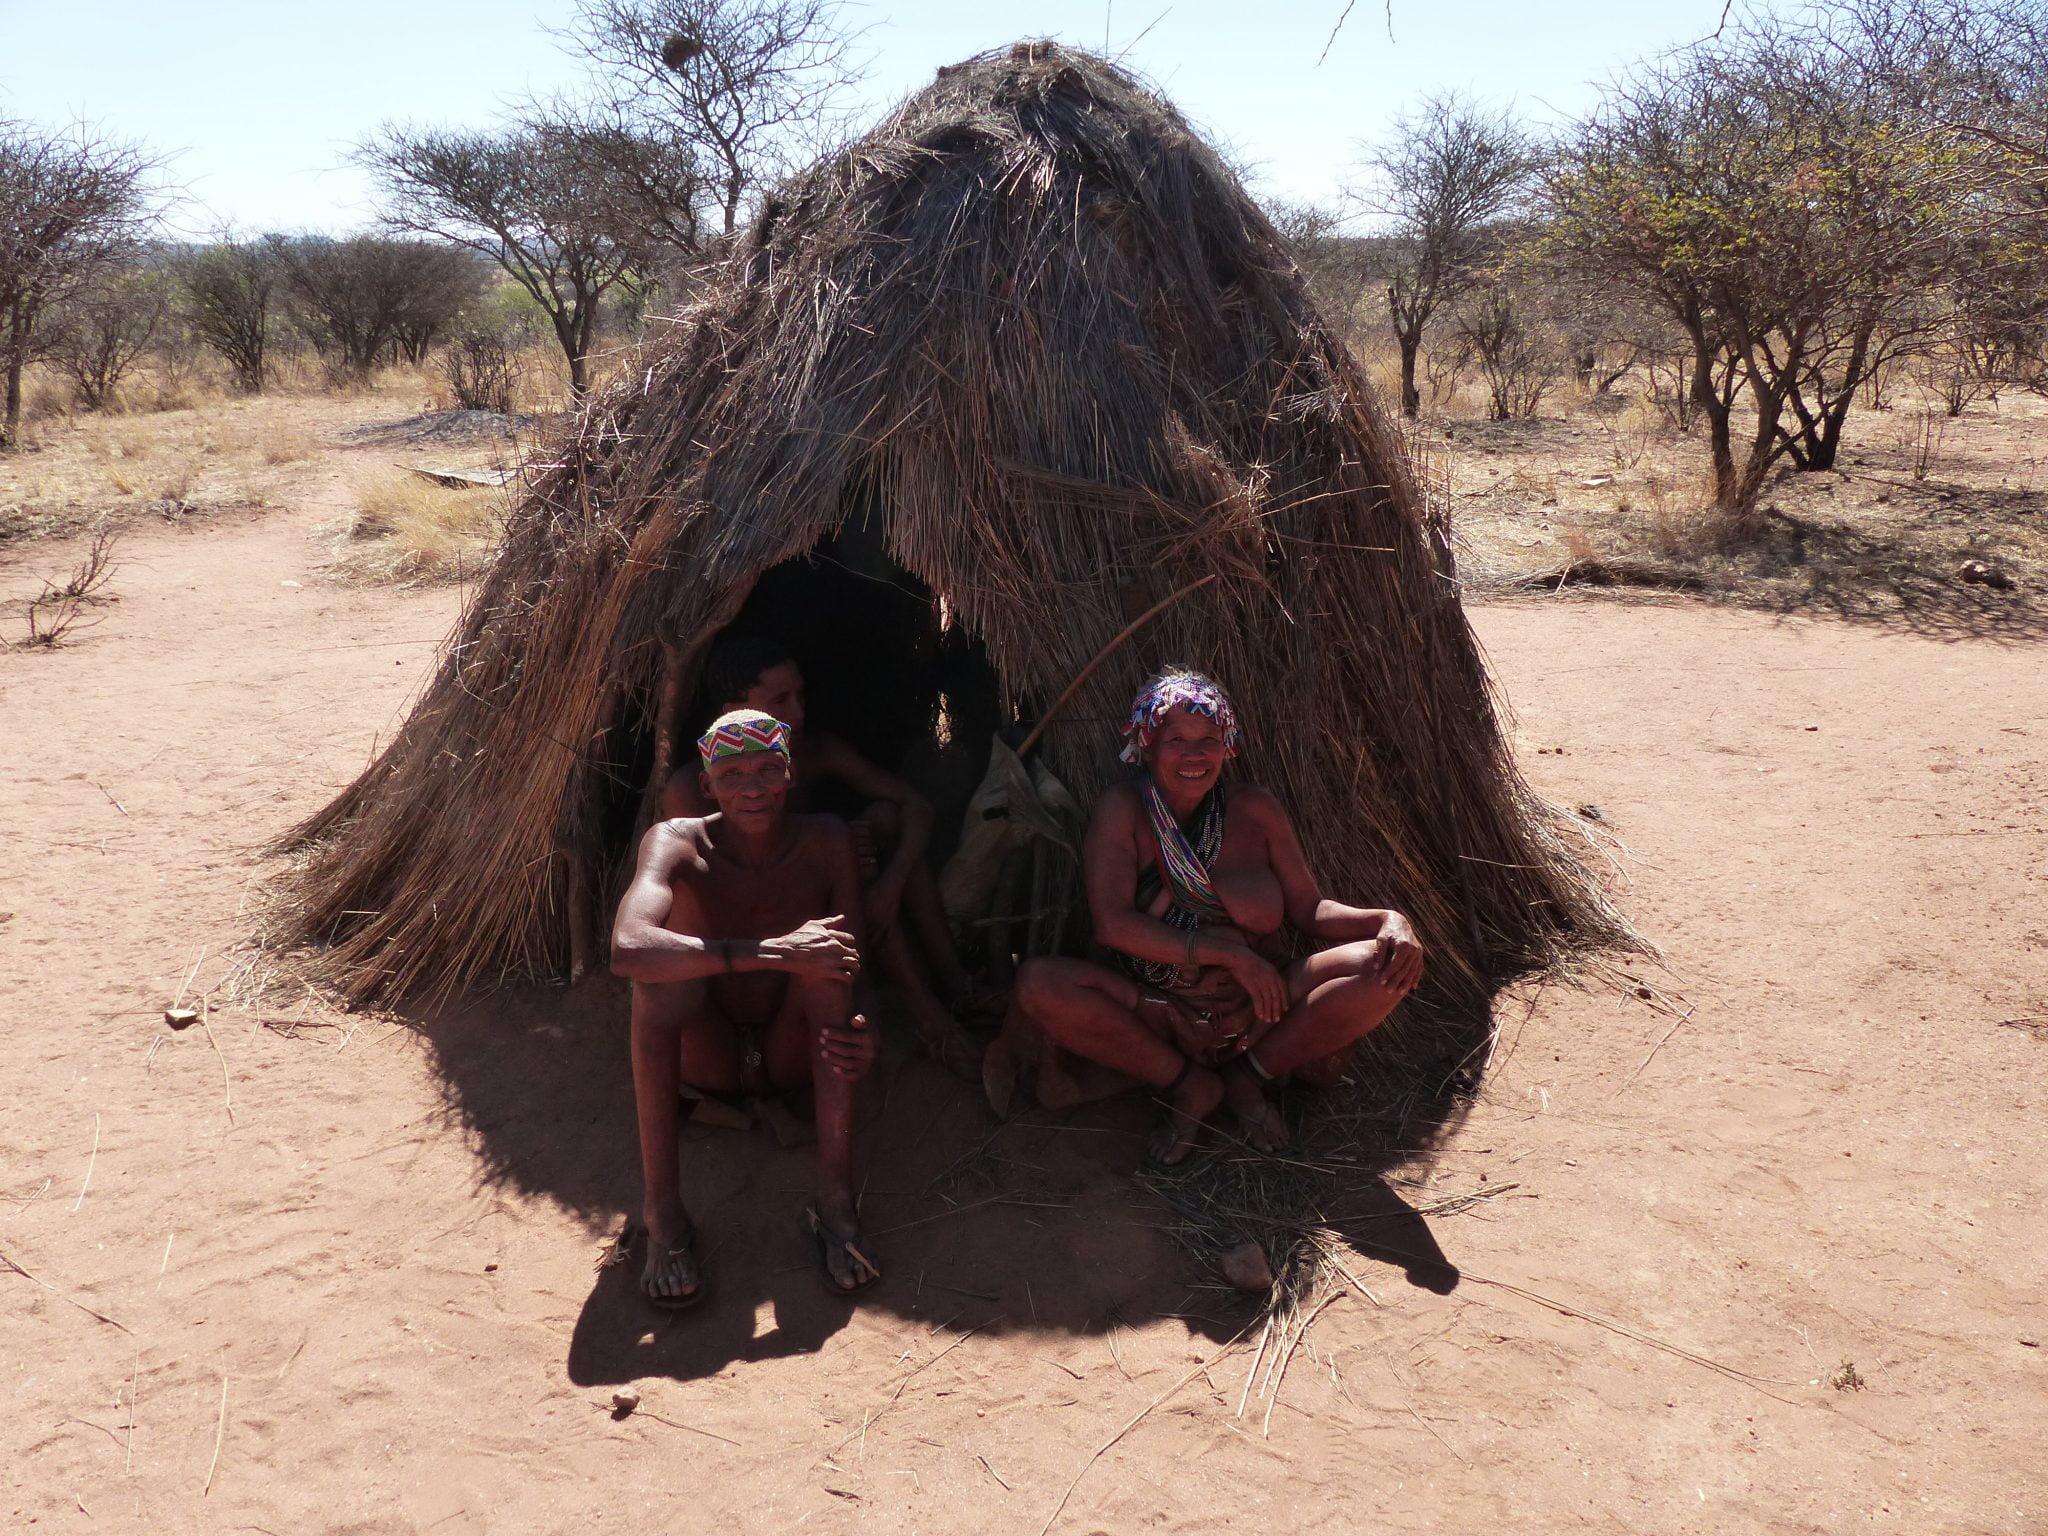 San People of Namibia